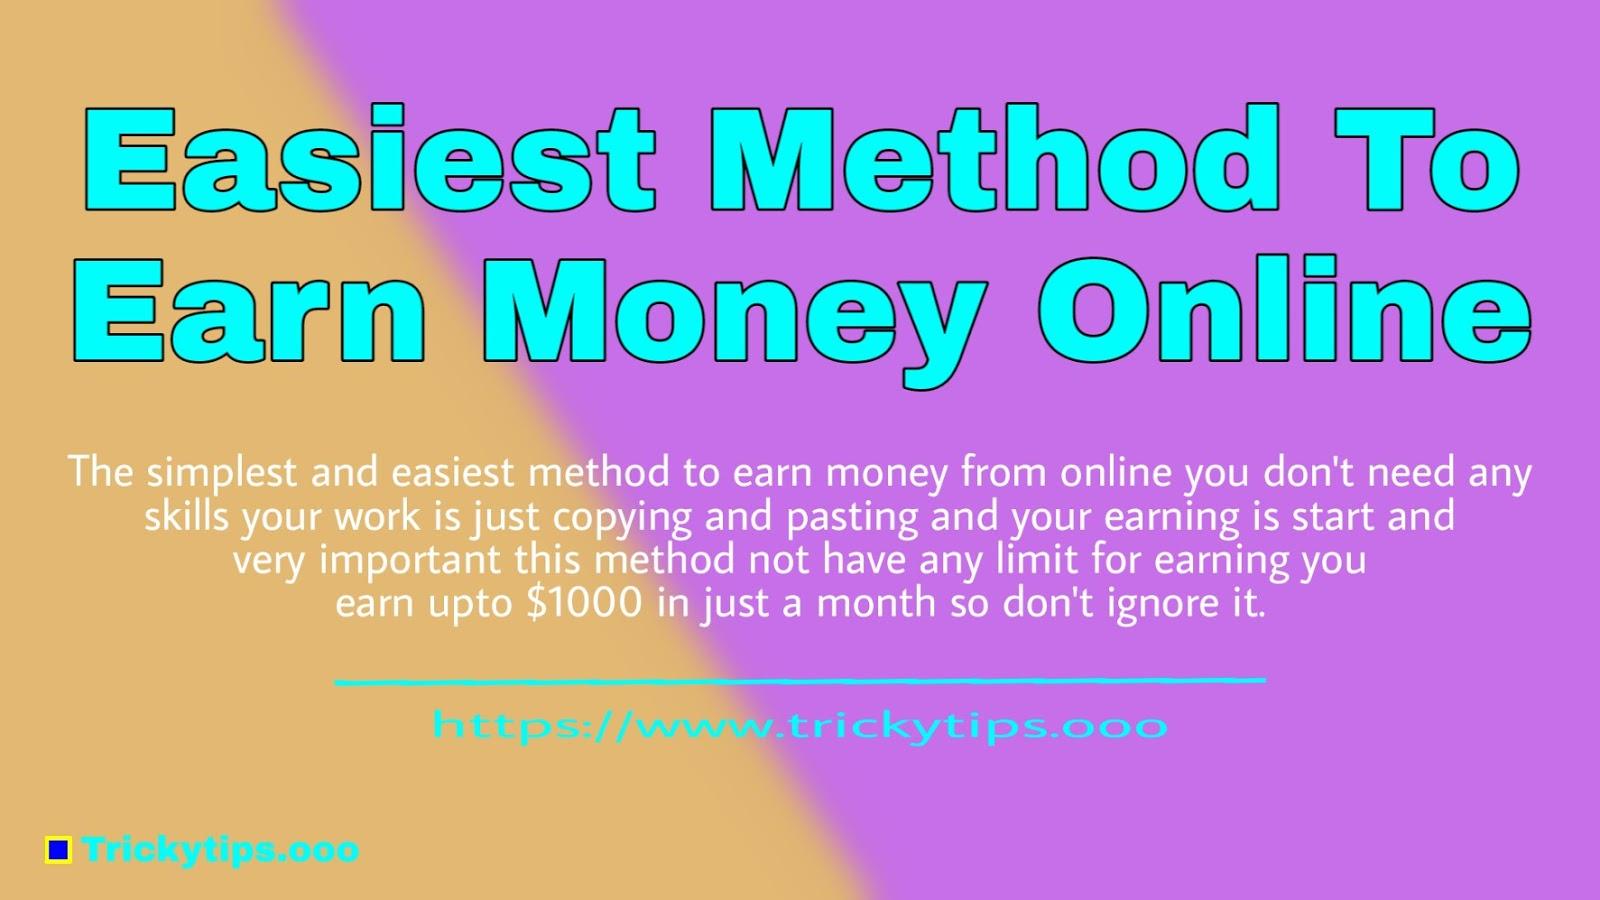 Easiest Method To Earn Money Online